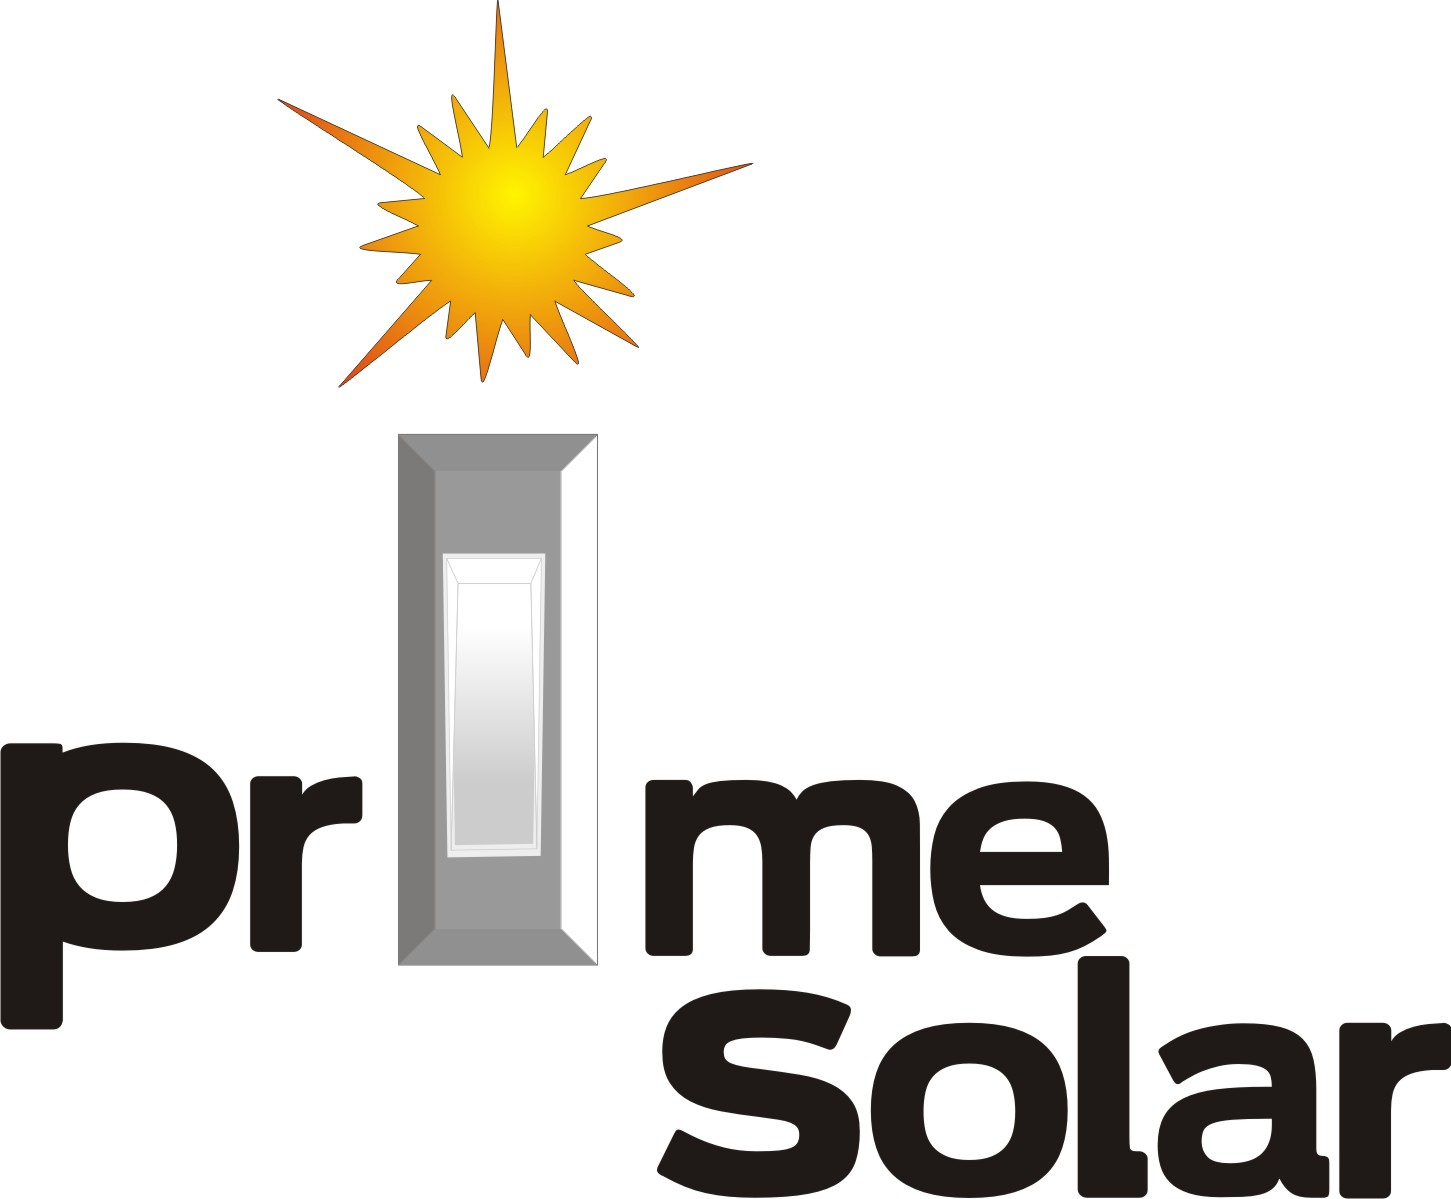 Логотип компании PrimeSolar [UPD: 16:45 15/12/11] фото f_4ef1ed8f357bd.jpg